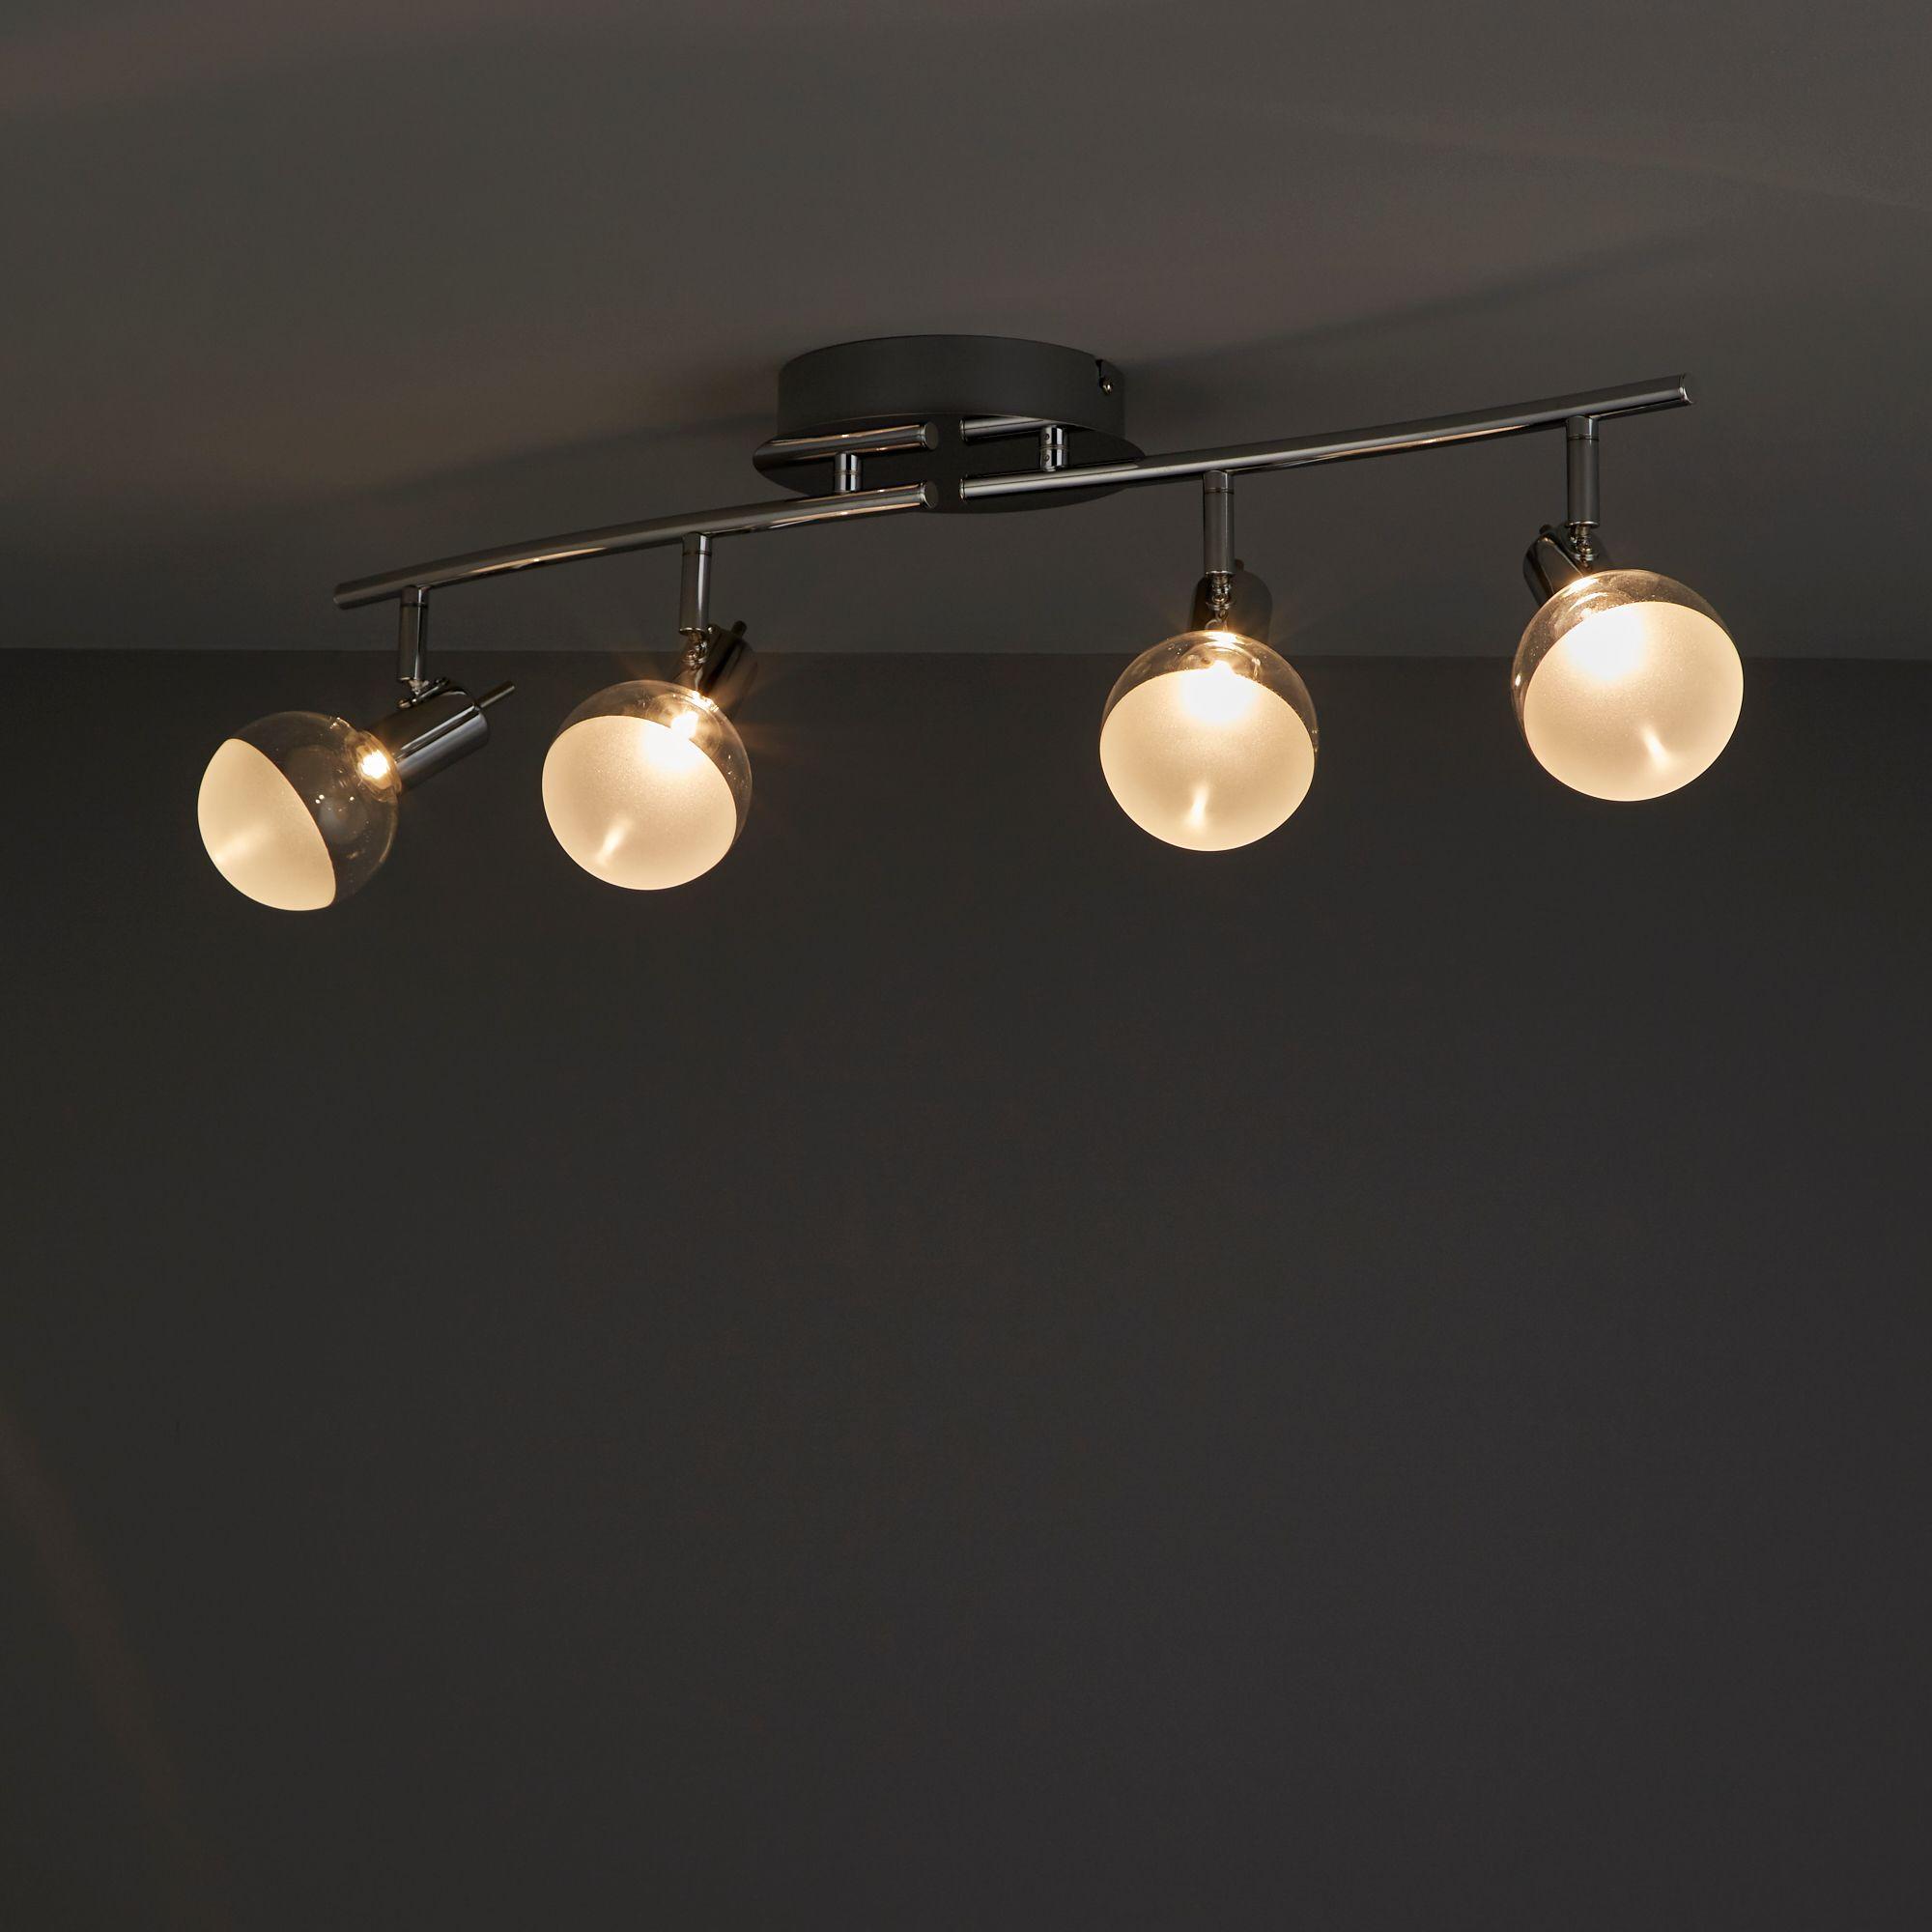 Panacea Chrome Effect Mains Ed 4 Lamp Spotlight Departments Diy At B Q